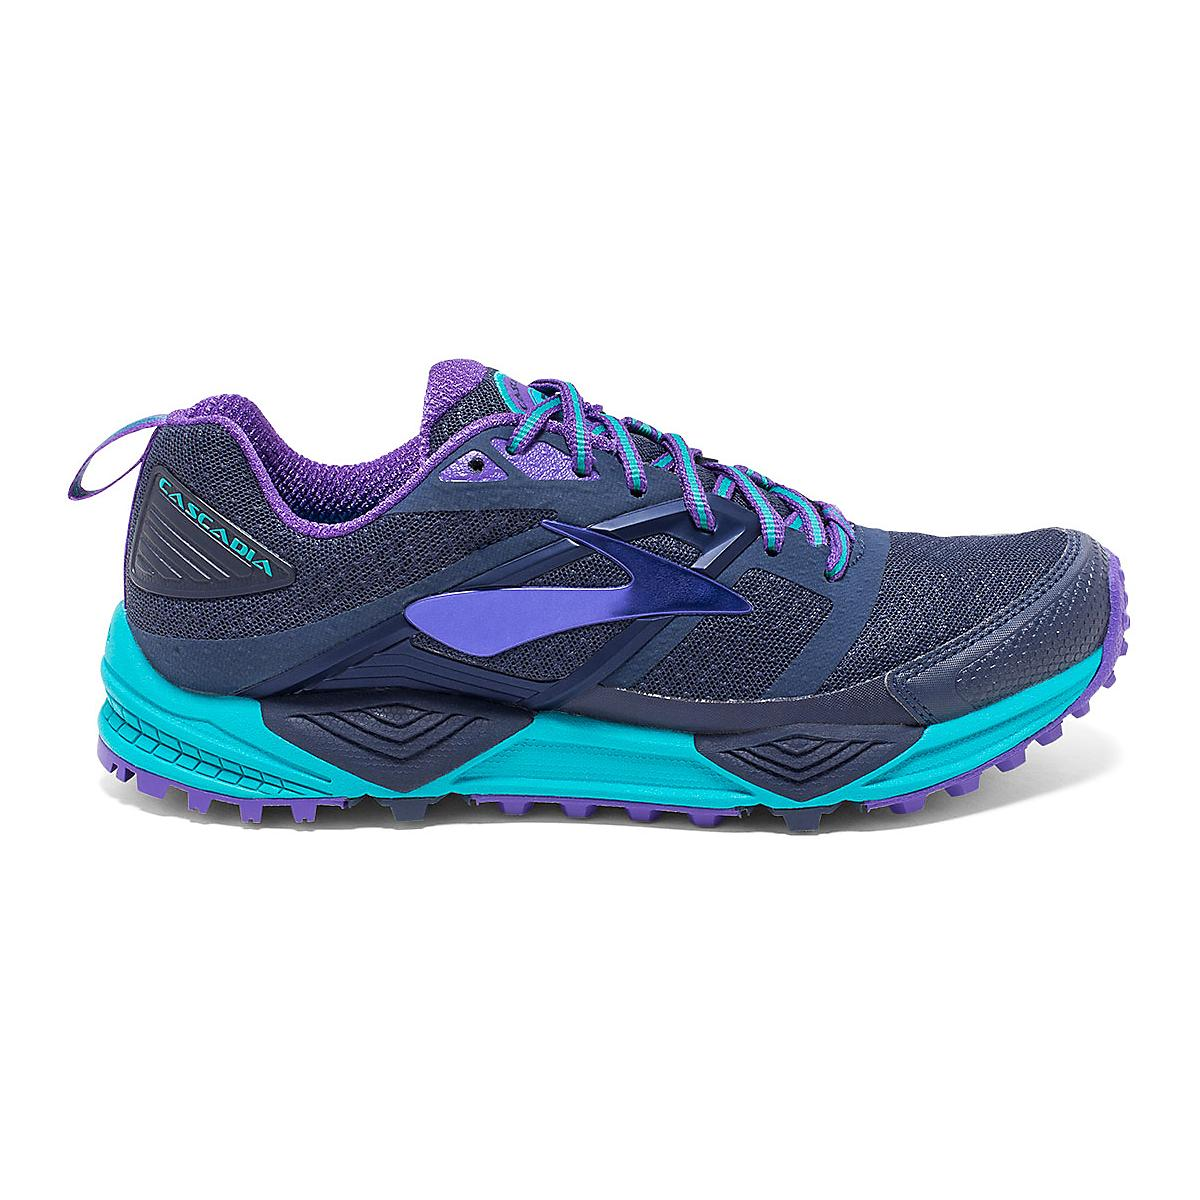 887a9d018f8 Women s Brooks Cascadia 12 Trail Running Shoes